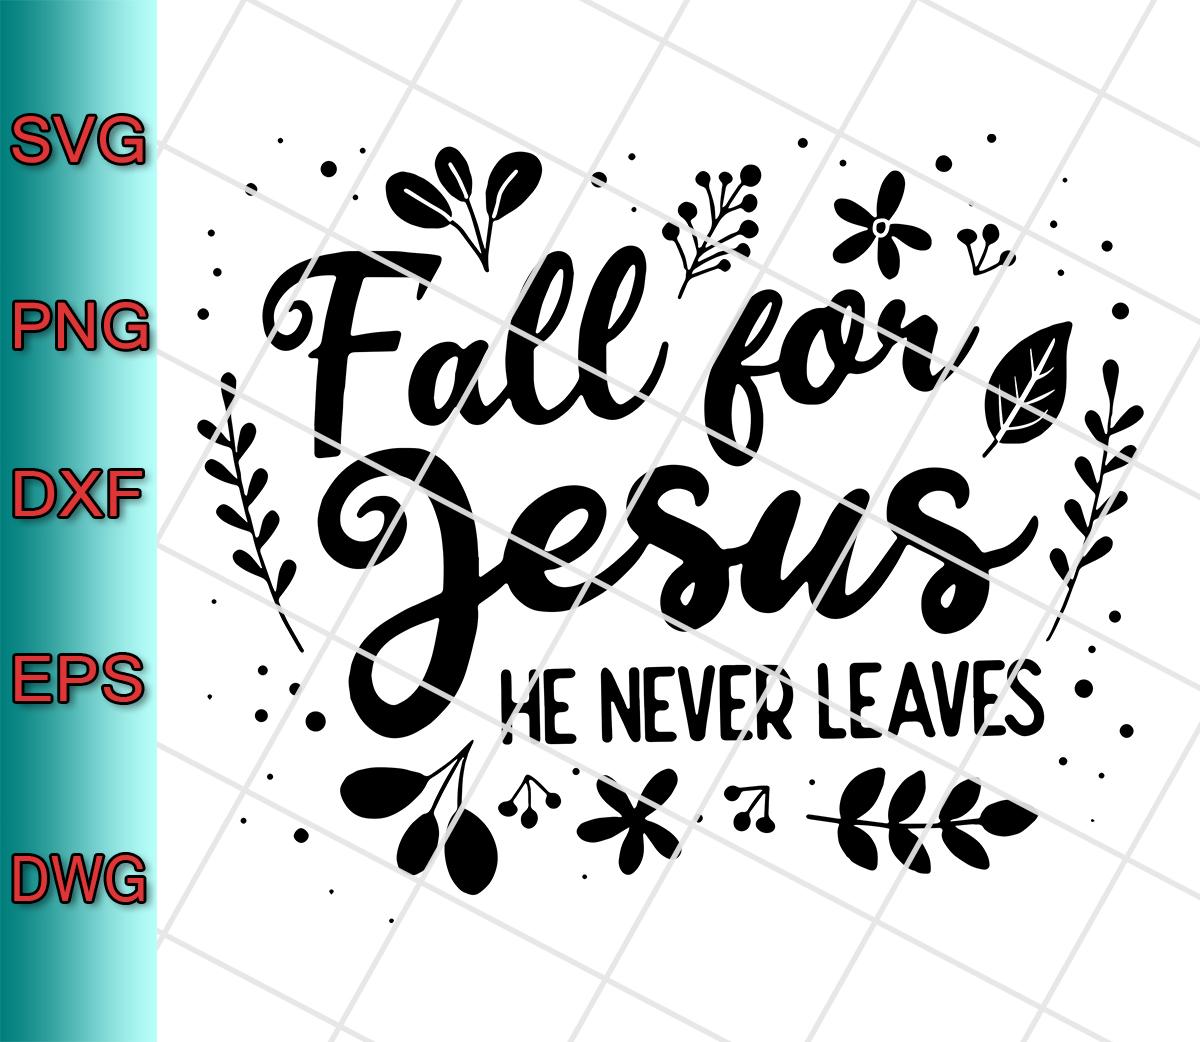 Fall For Jesus He Never Leaves Svg Png Eps Dxf Cut File Designs Digital Download